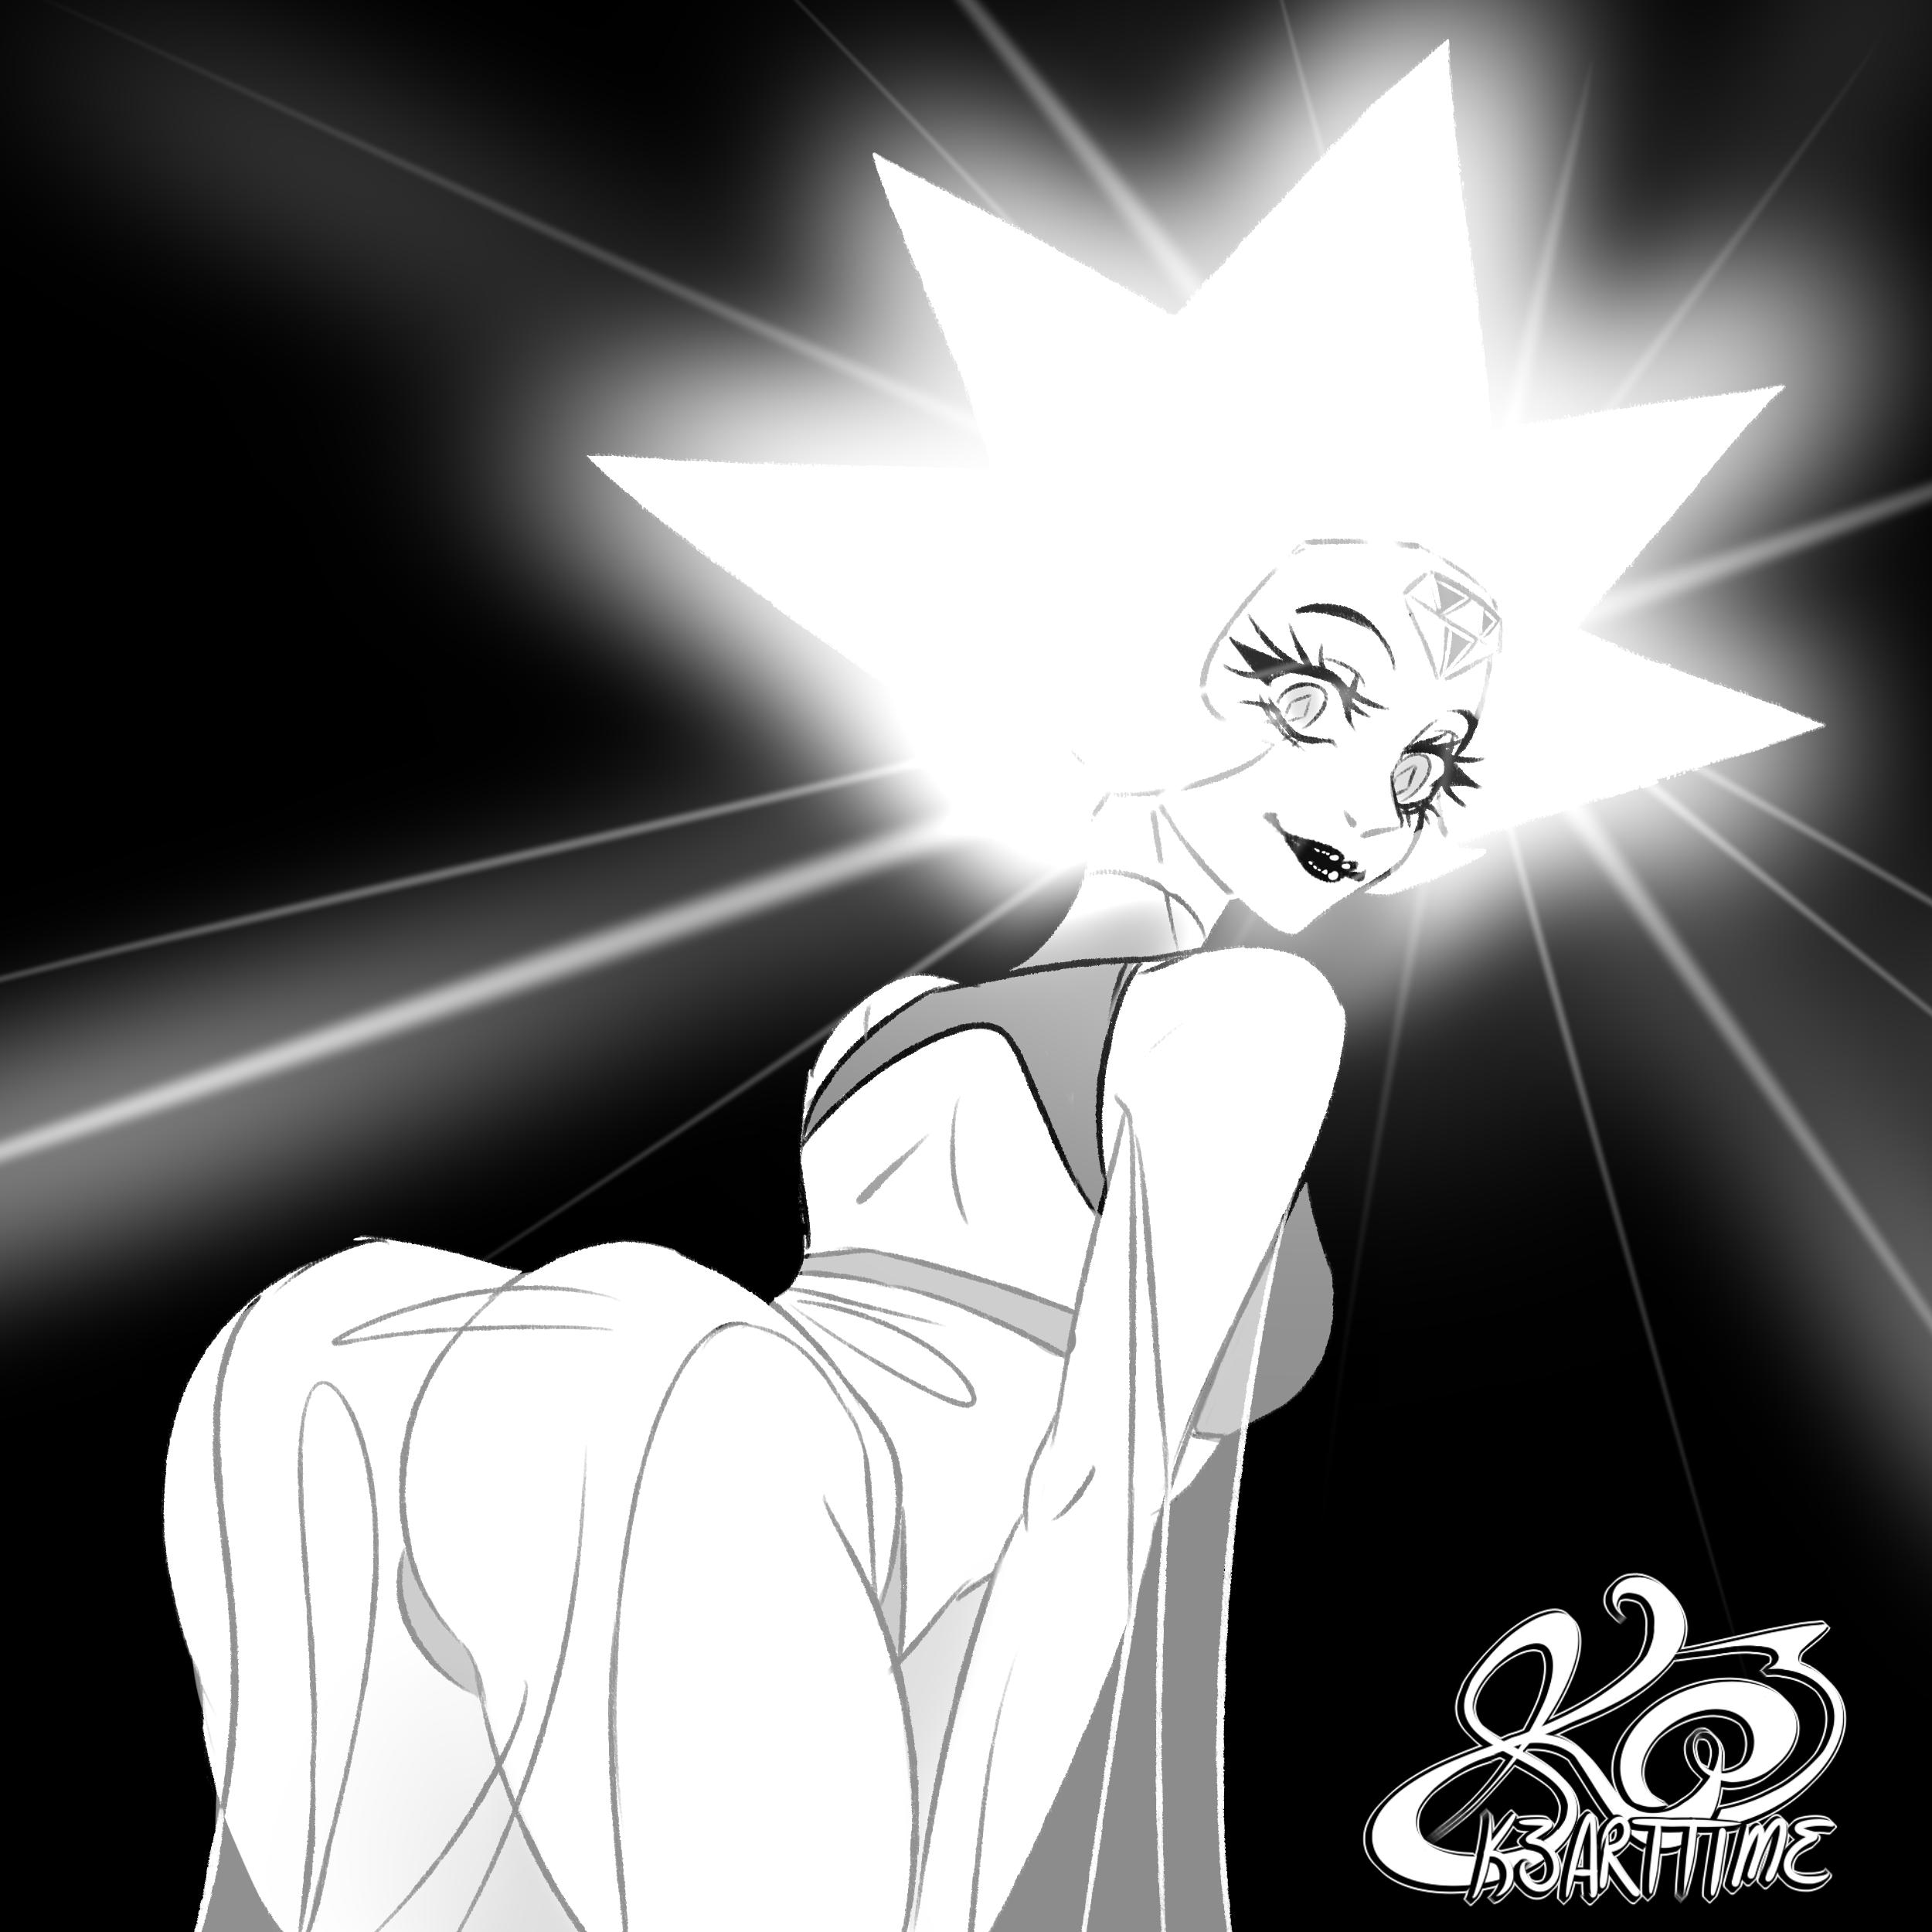 White Diamond sekushii